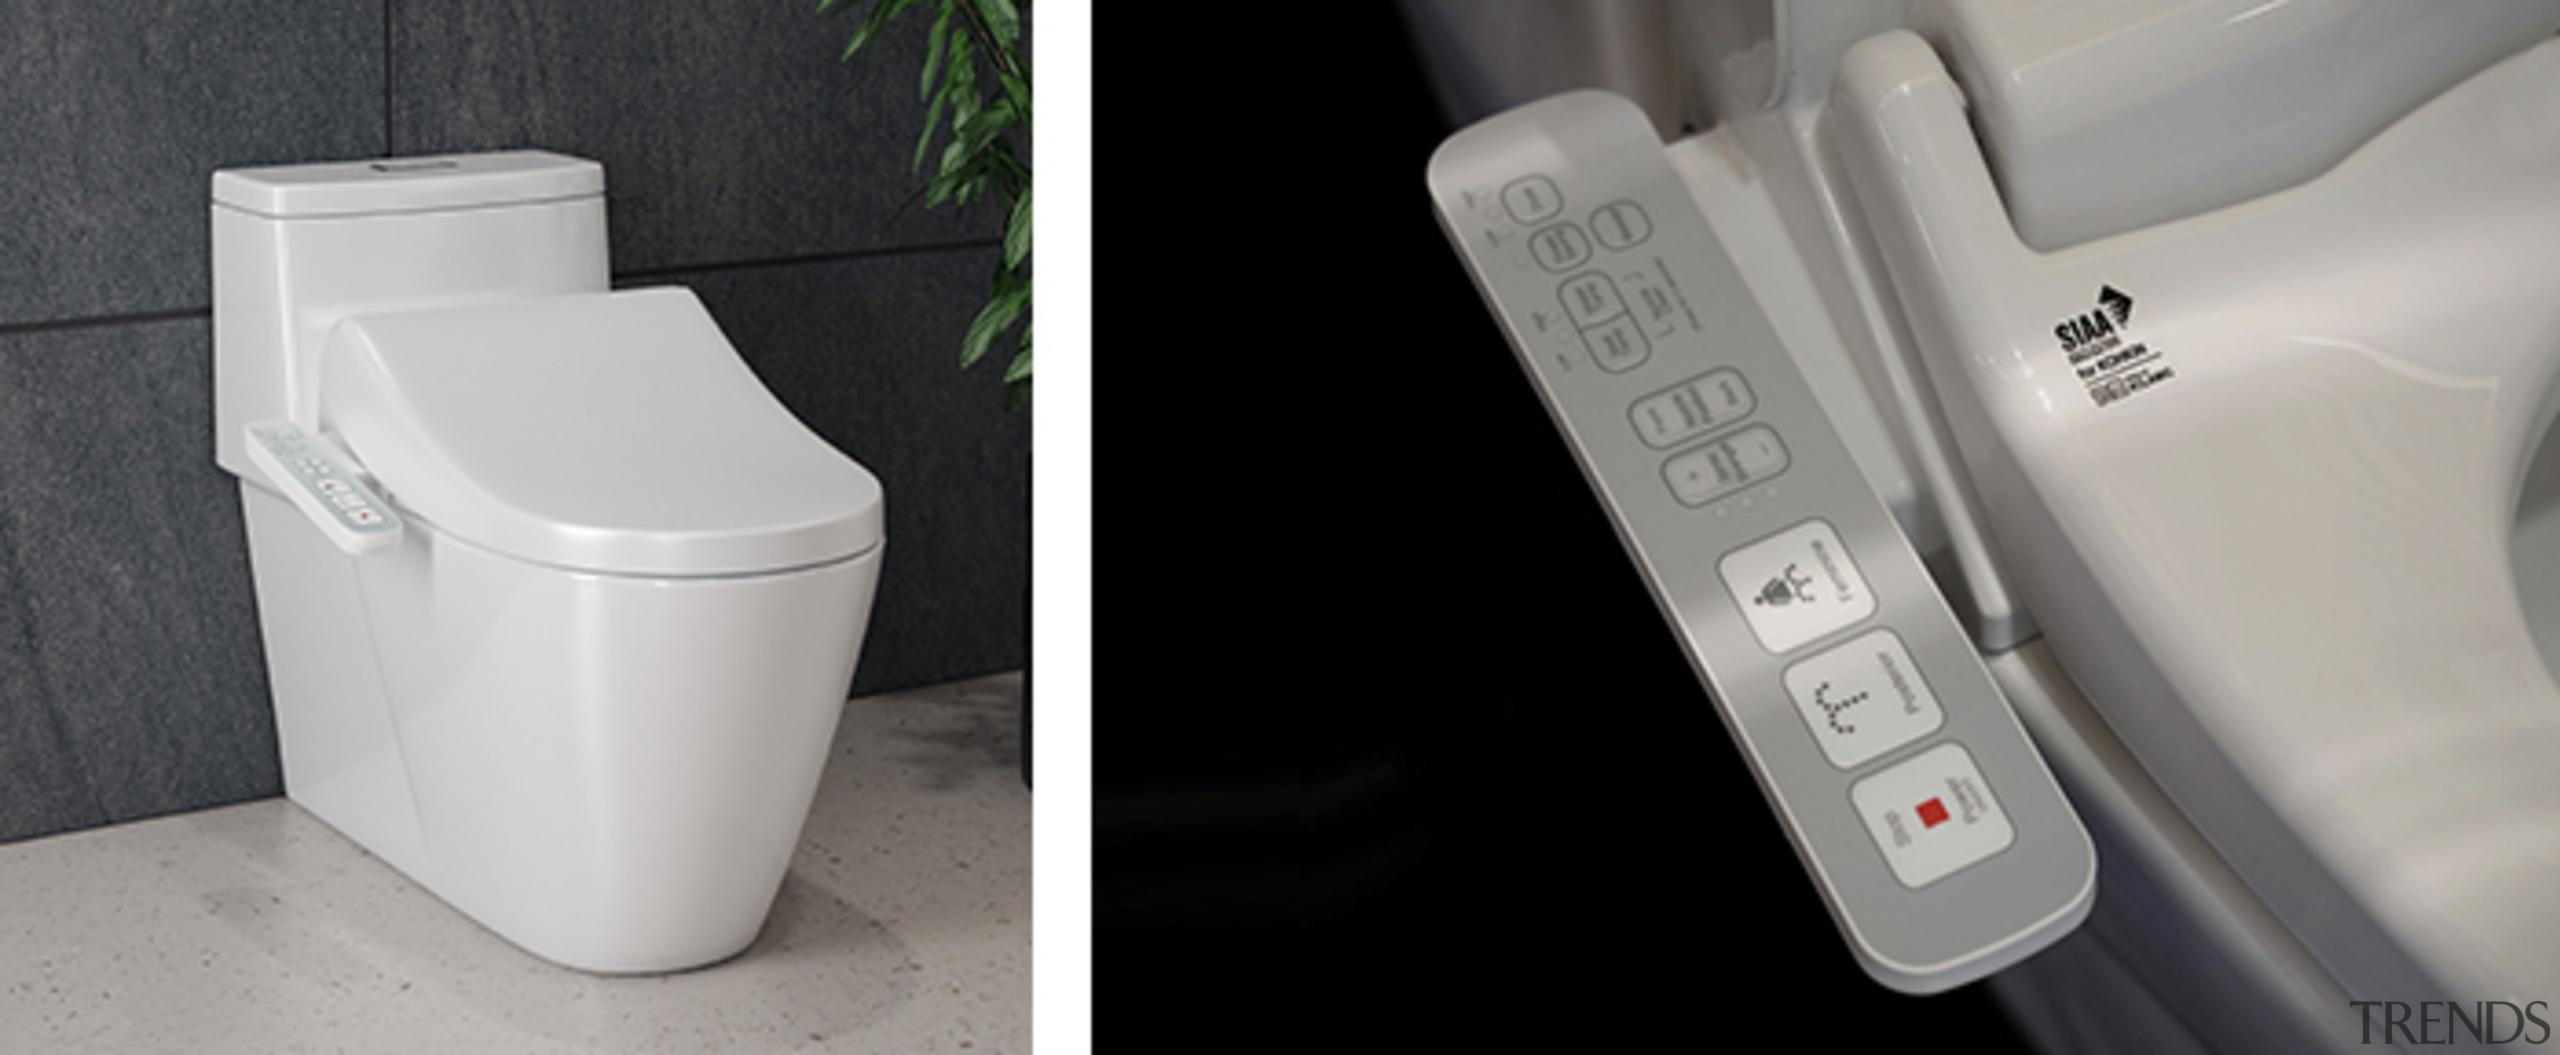 American Standard Pristine E-Bidet – available at Robertson bidet, material property, plumbing fixture, product, toilet, toilet seat, gray, black